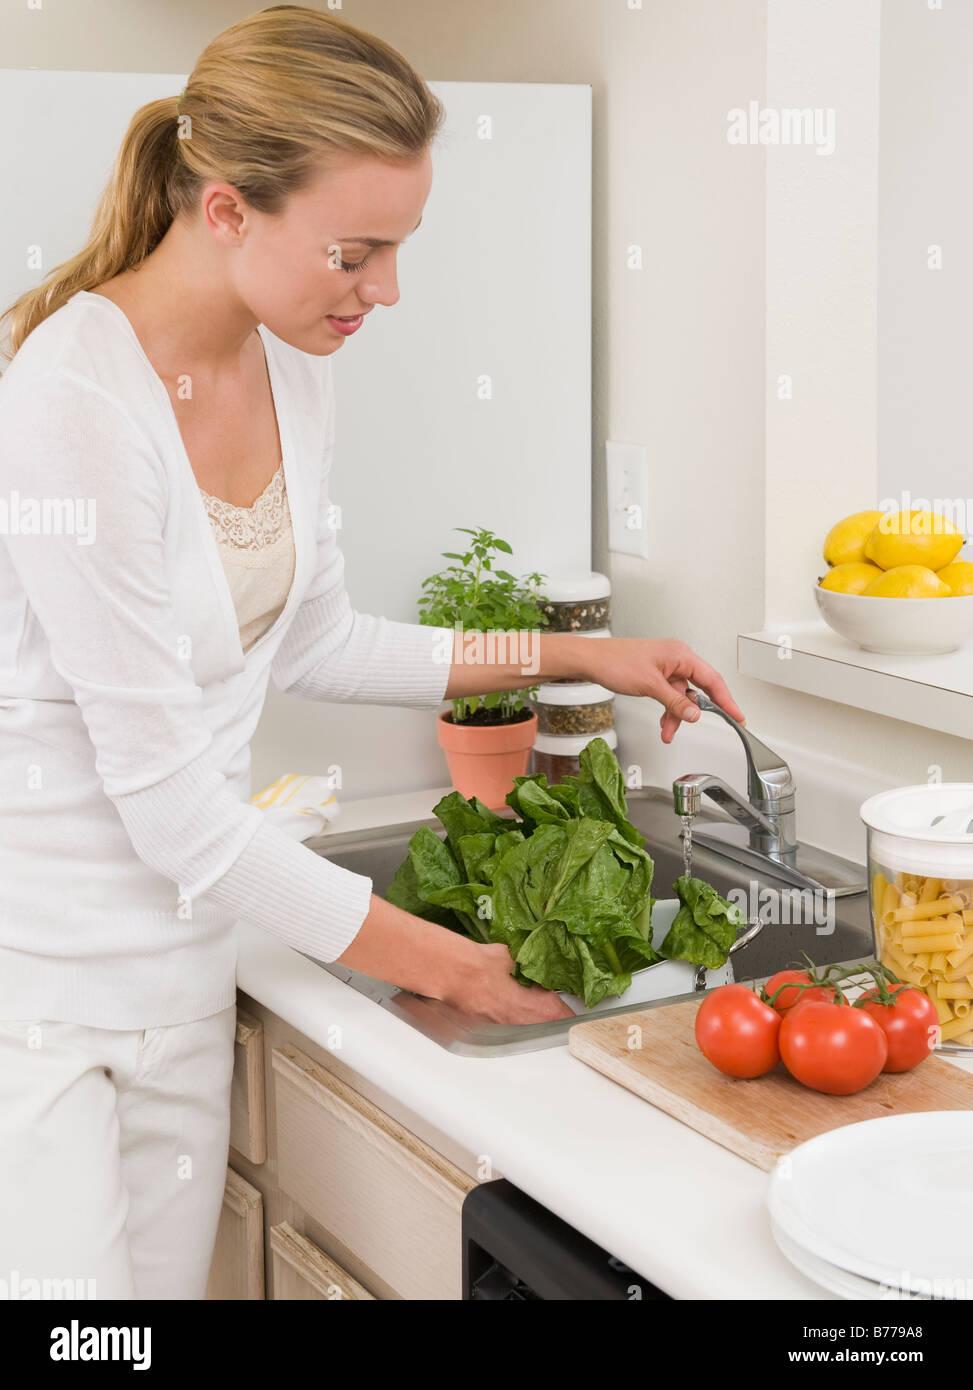 Kitchen Faucet Woman